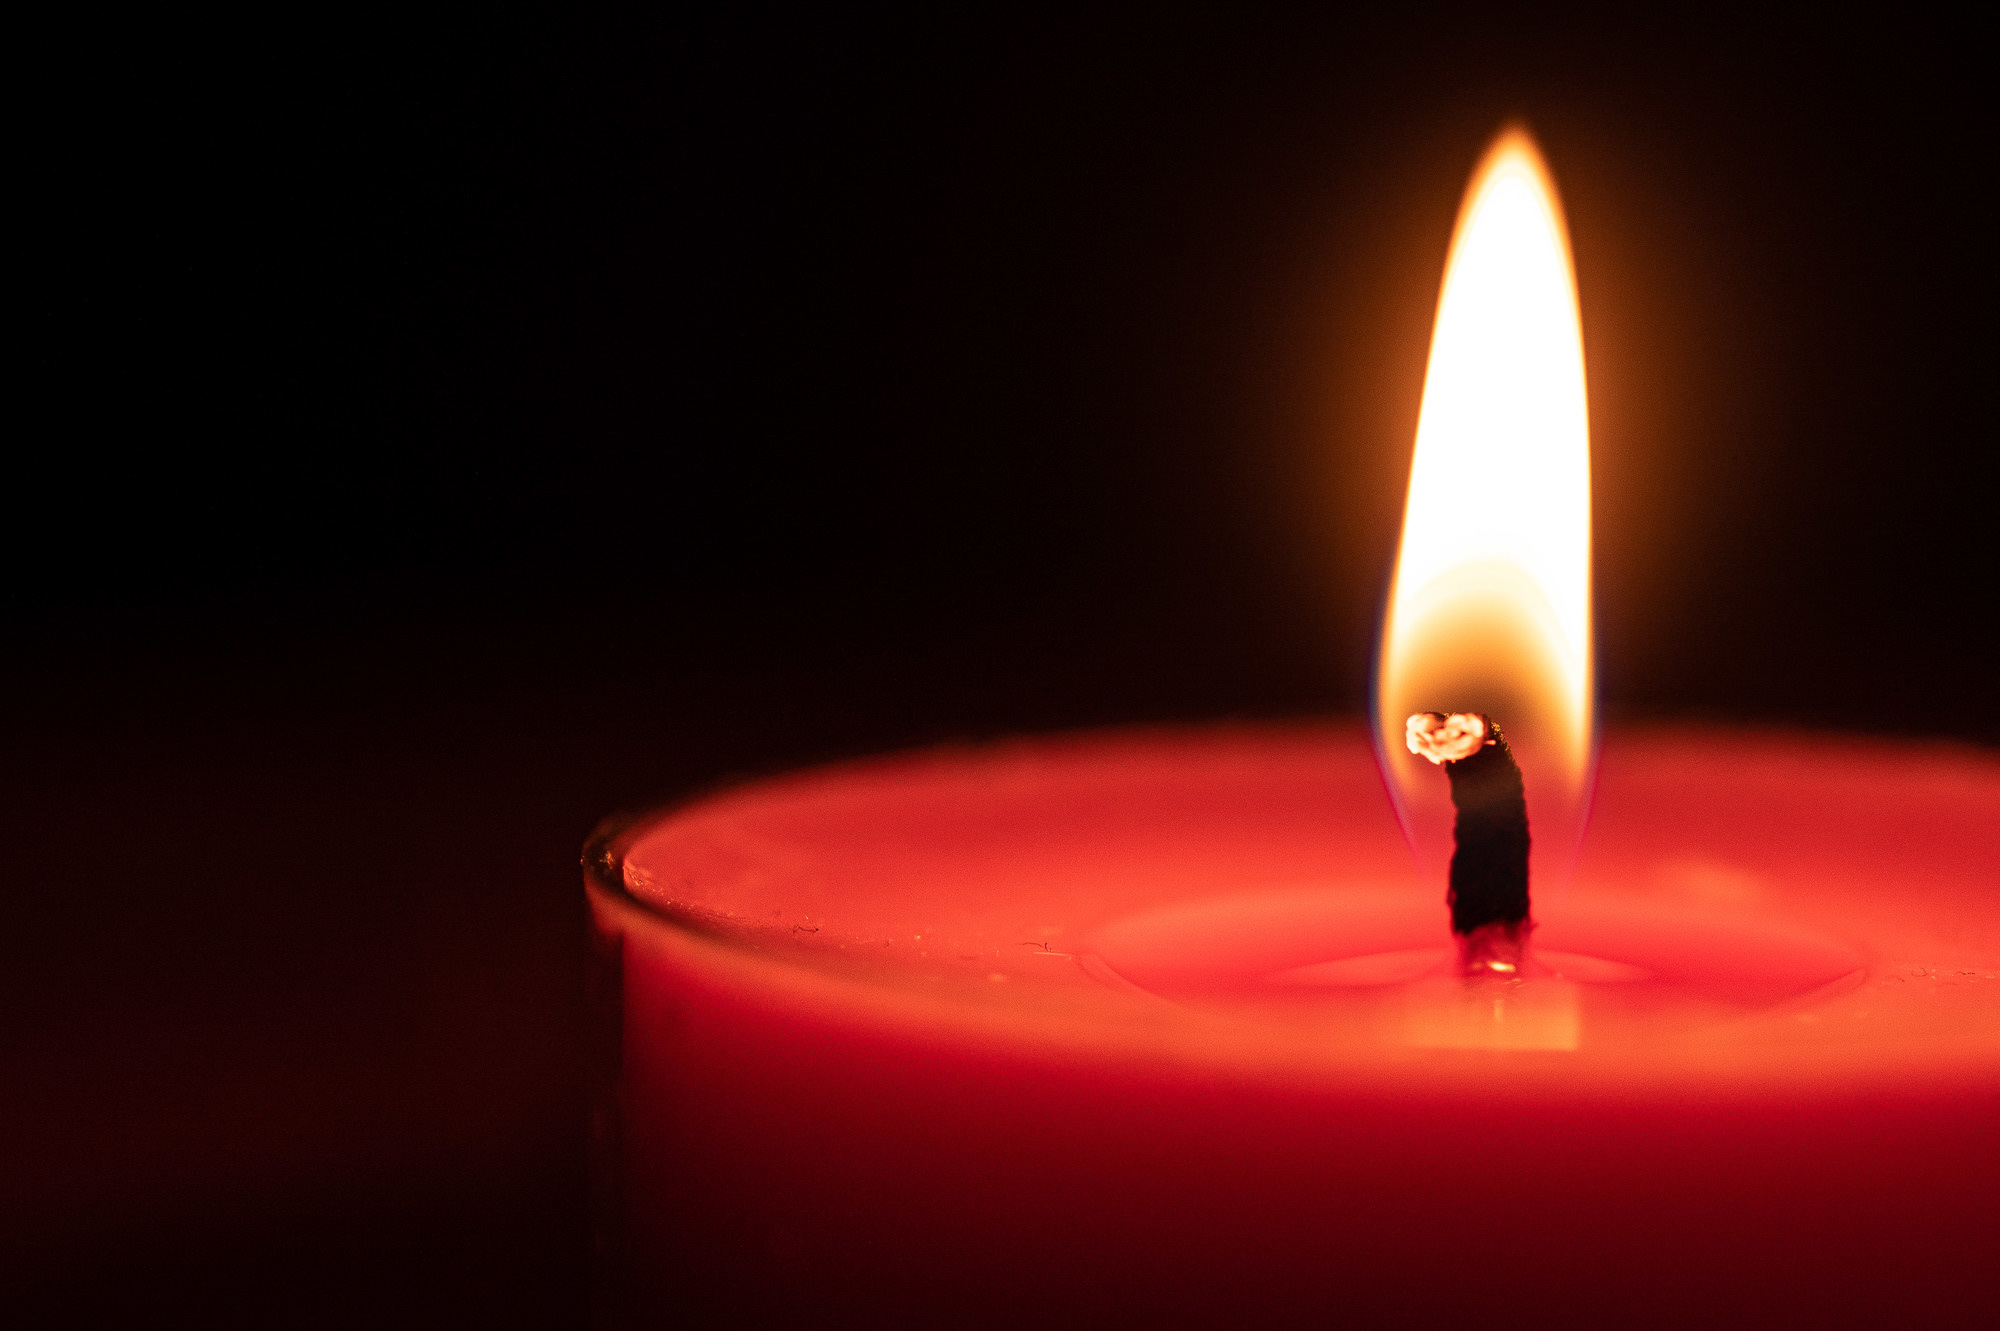 heiße Flamme